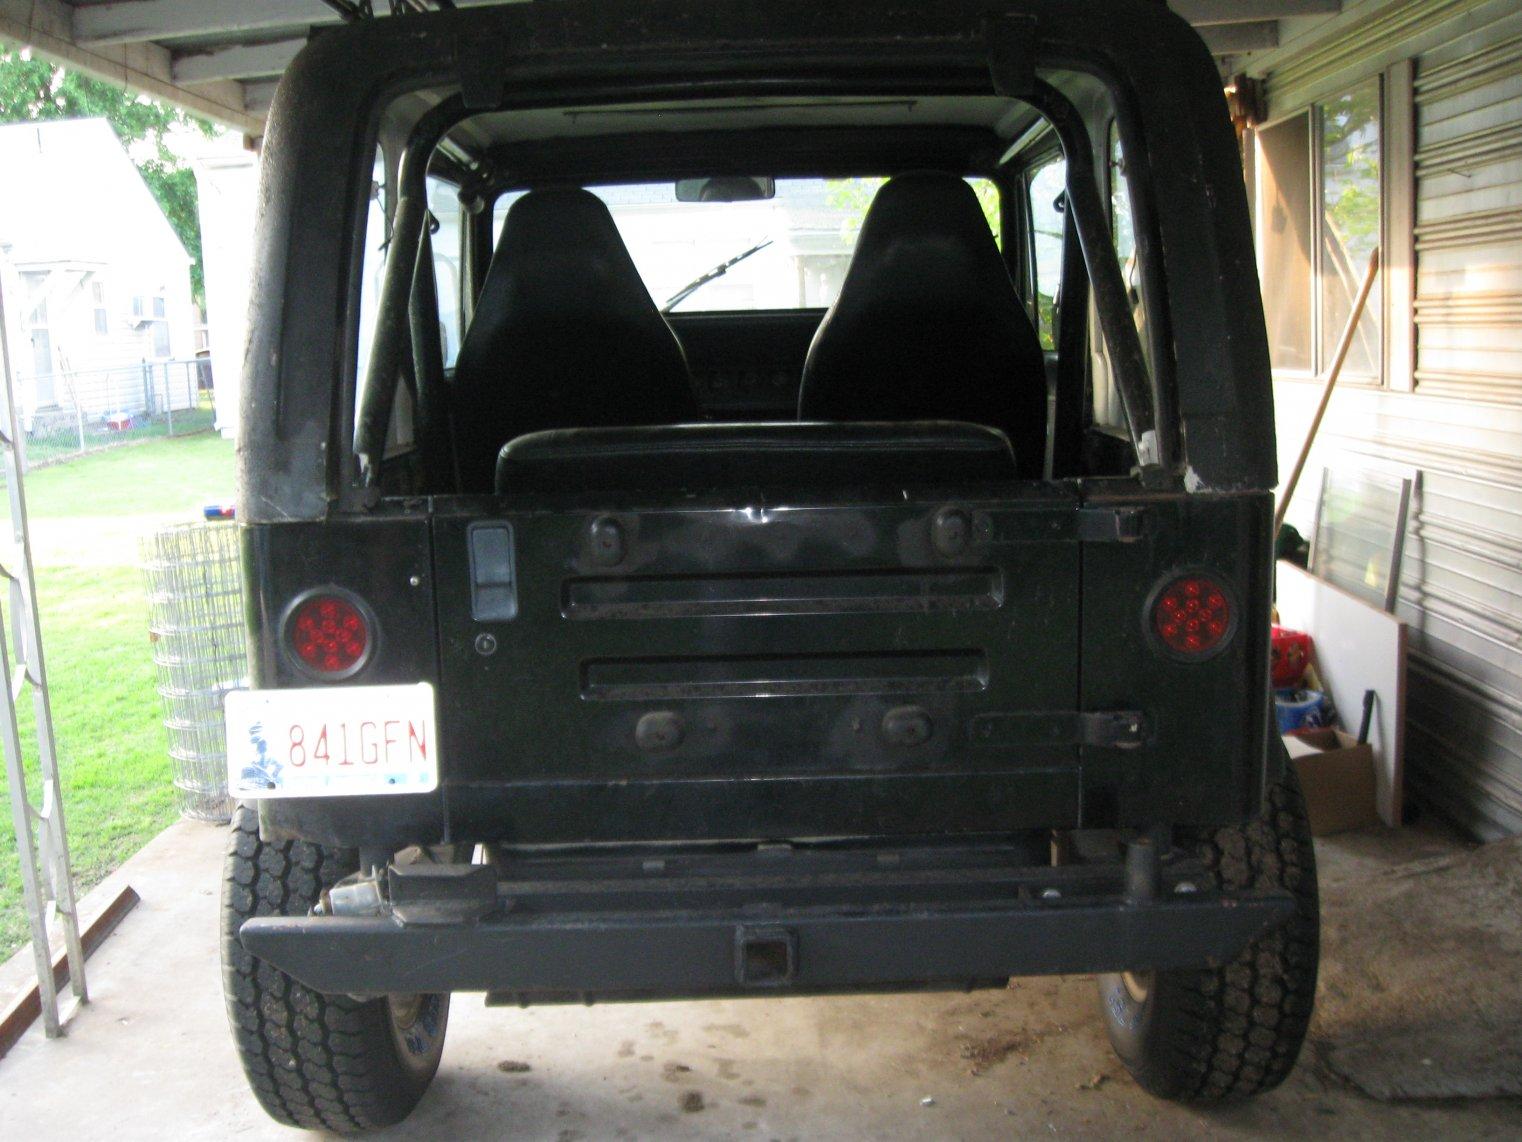 5-6-jeep-001.jpg